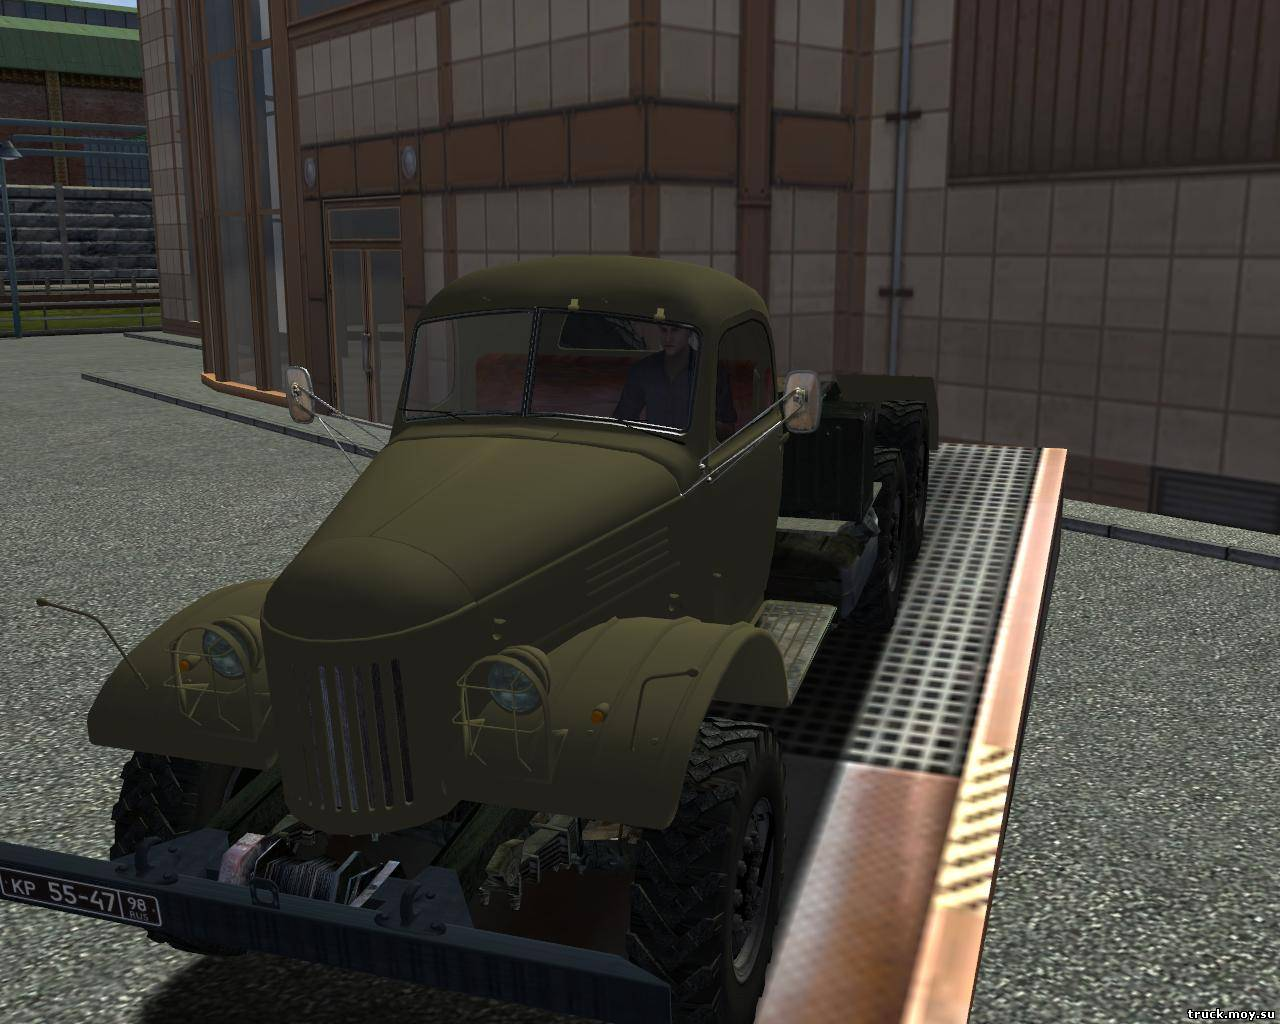 Раритетный ЗИЛ 157 ВТ для игры Euro Truck Simulator. . Заменяет Runner кла